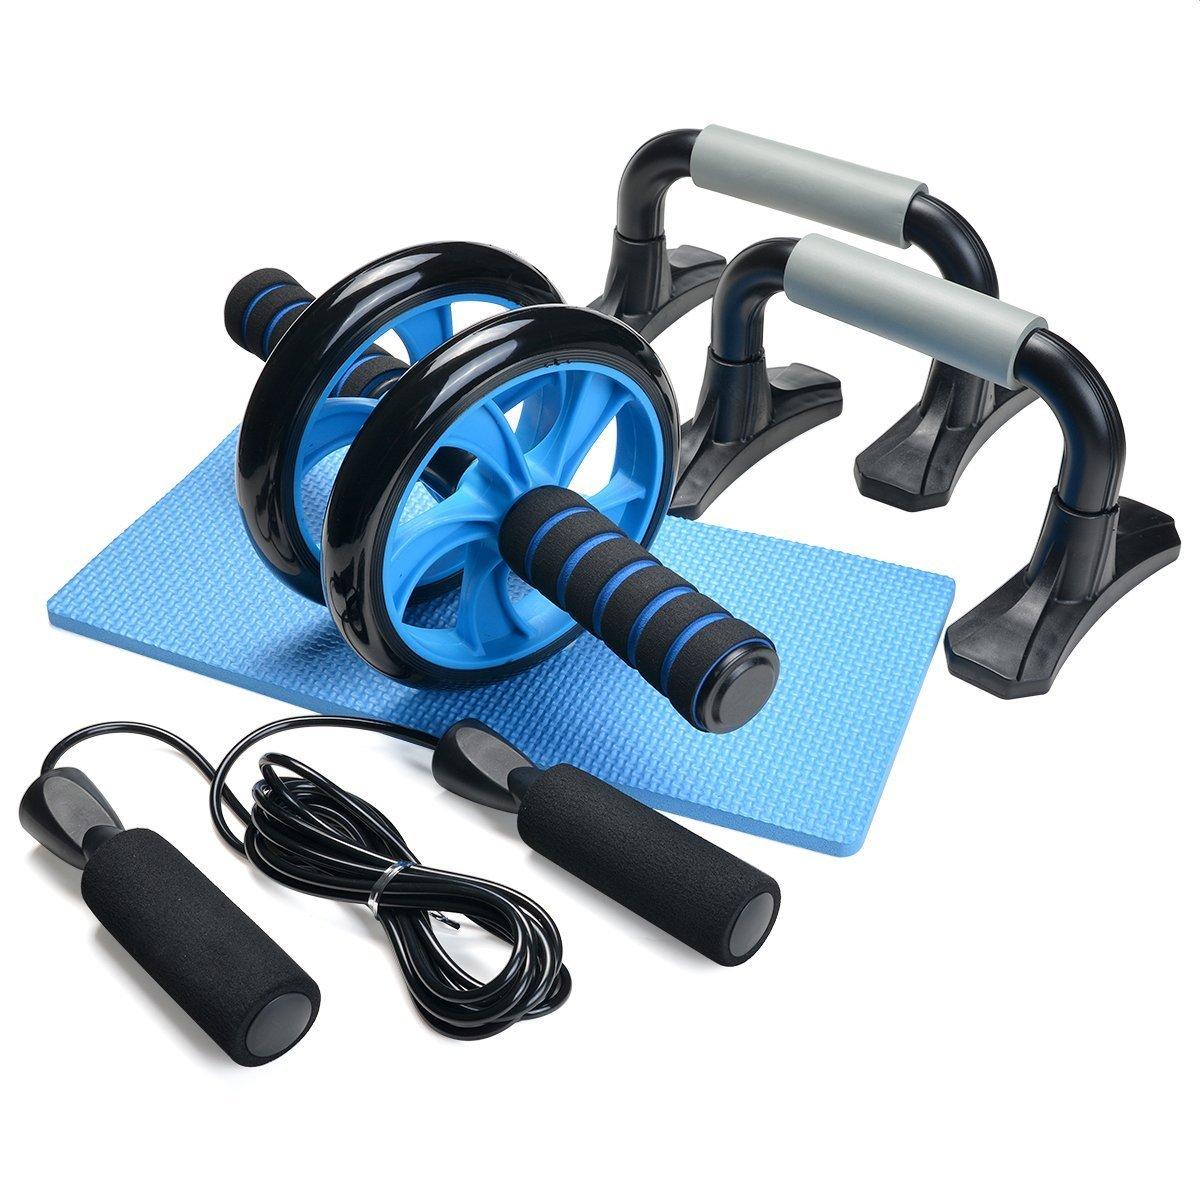 Odoland Wheel Roller Push Up Jump Image 1